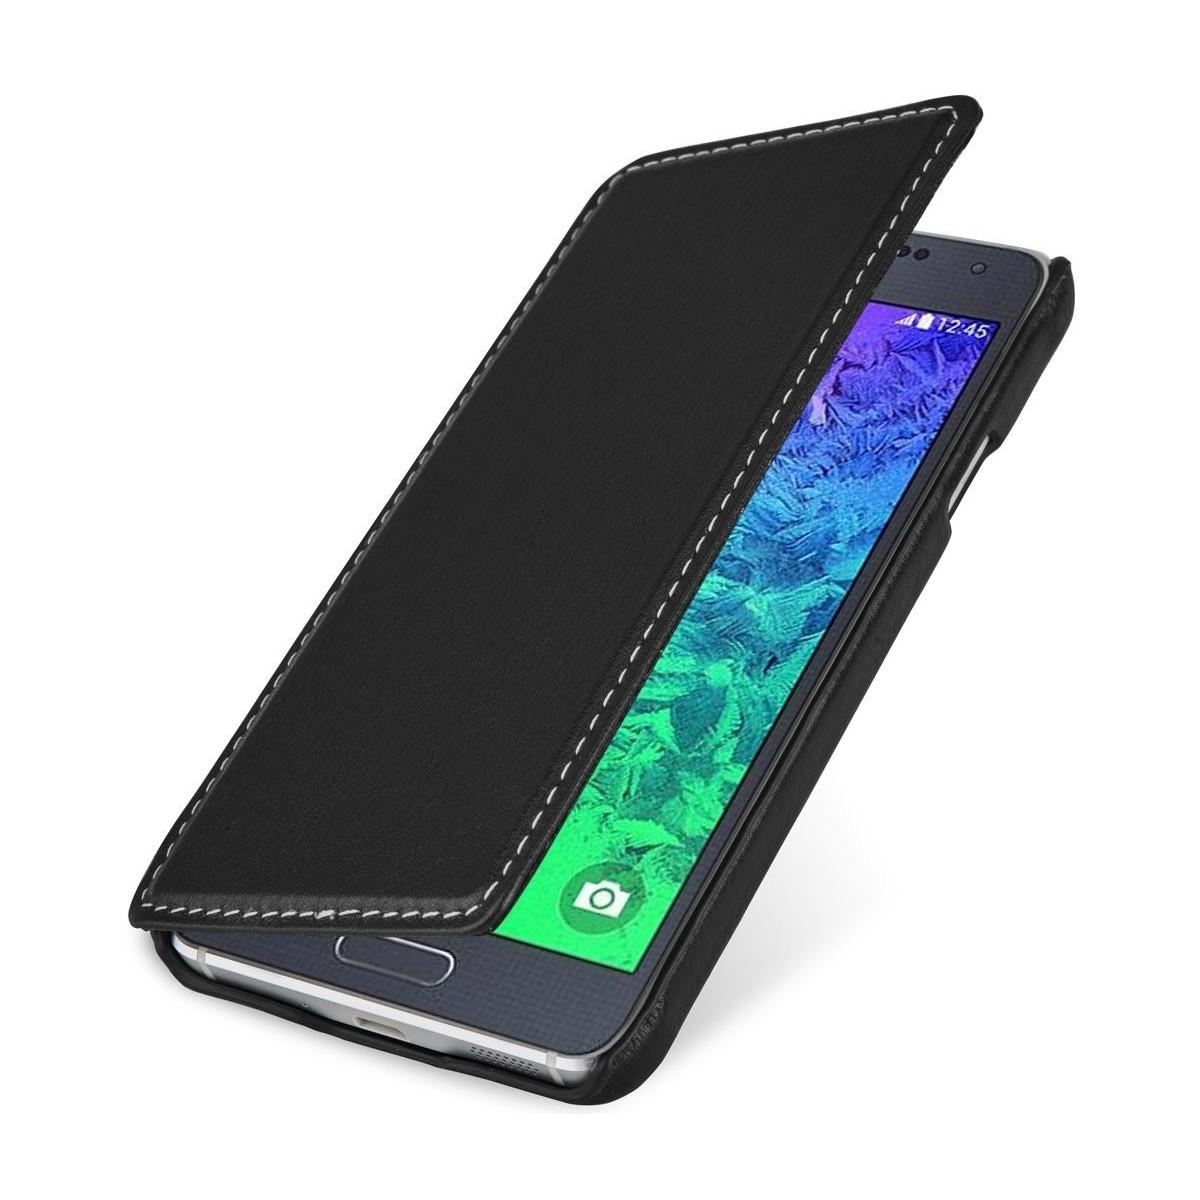 Etui Samsung Galaxy Alpha Book Type noir en cuir véritable - Stilgut